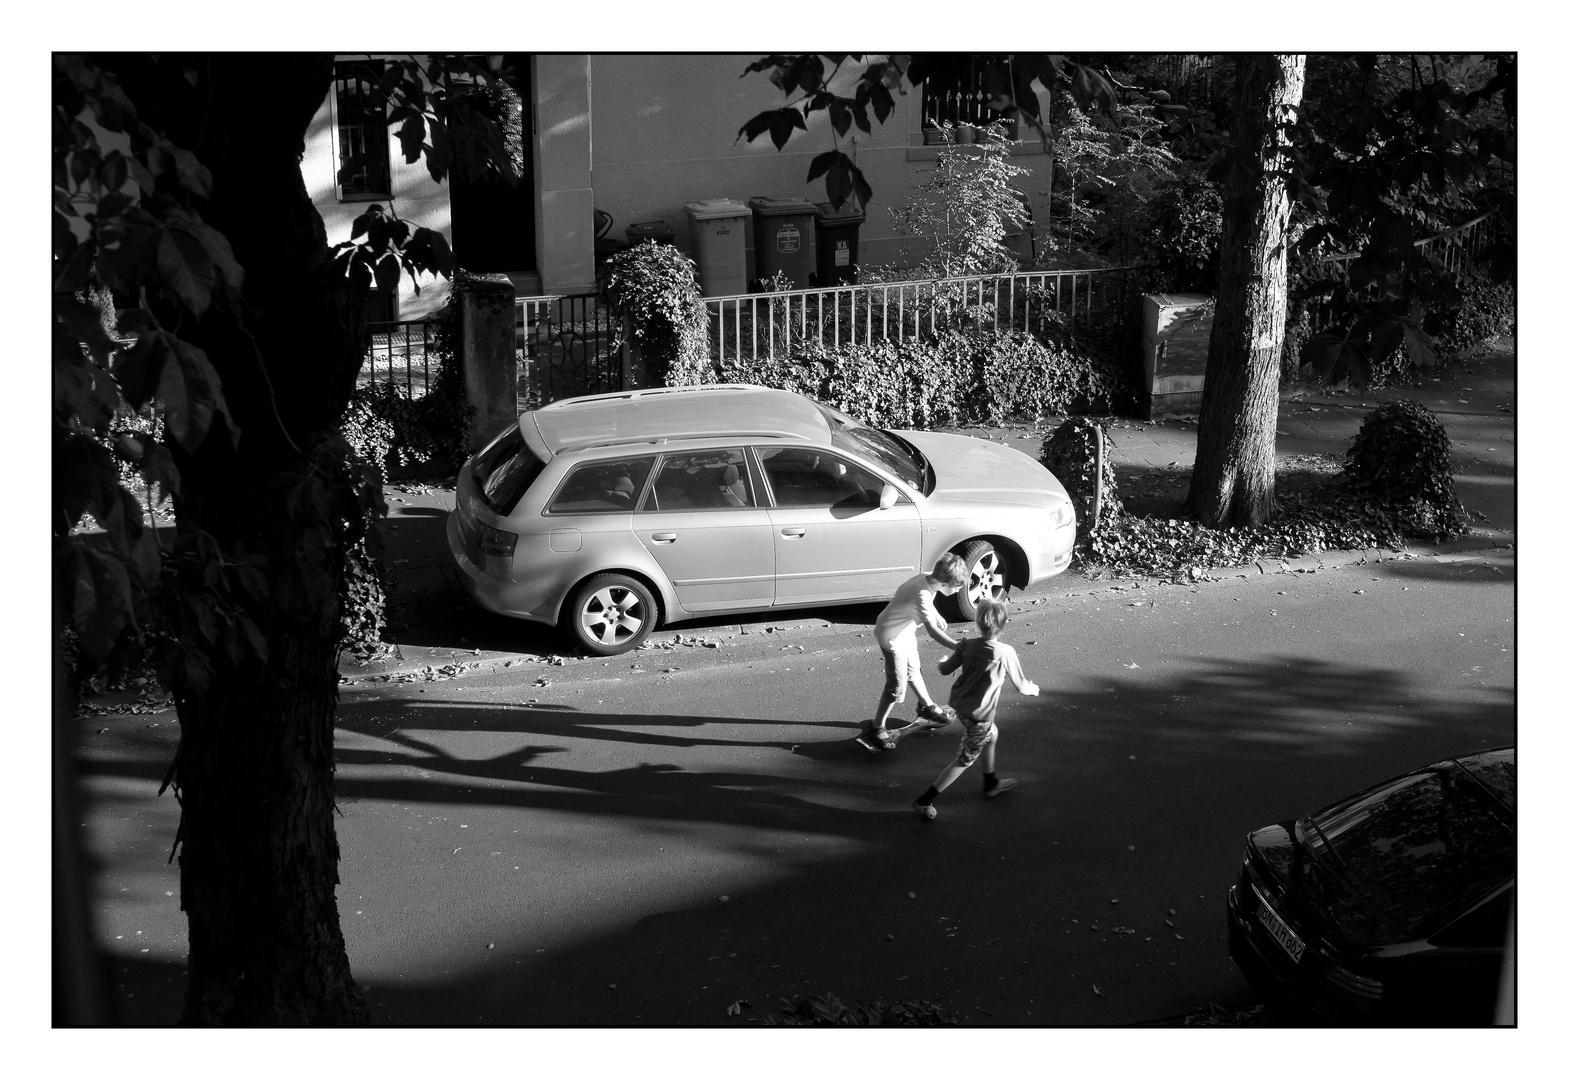 Run, skate, drive